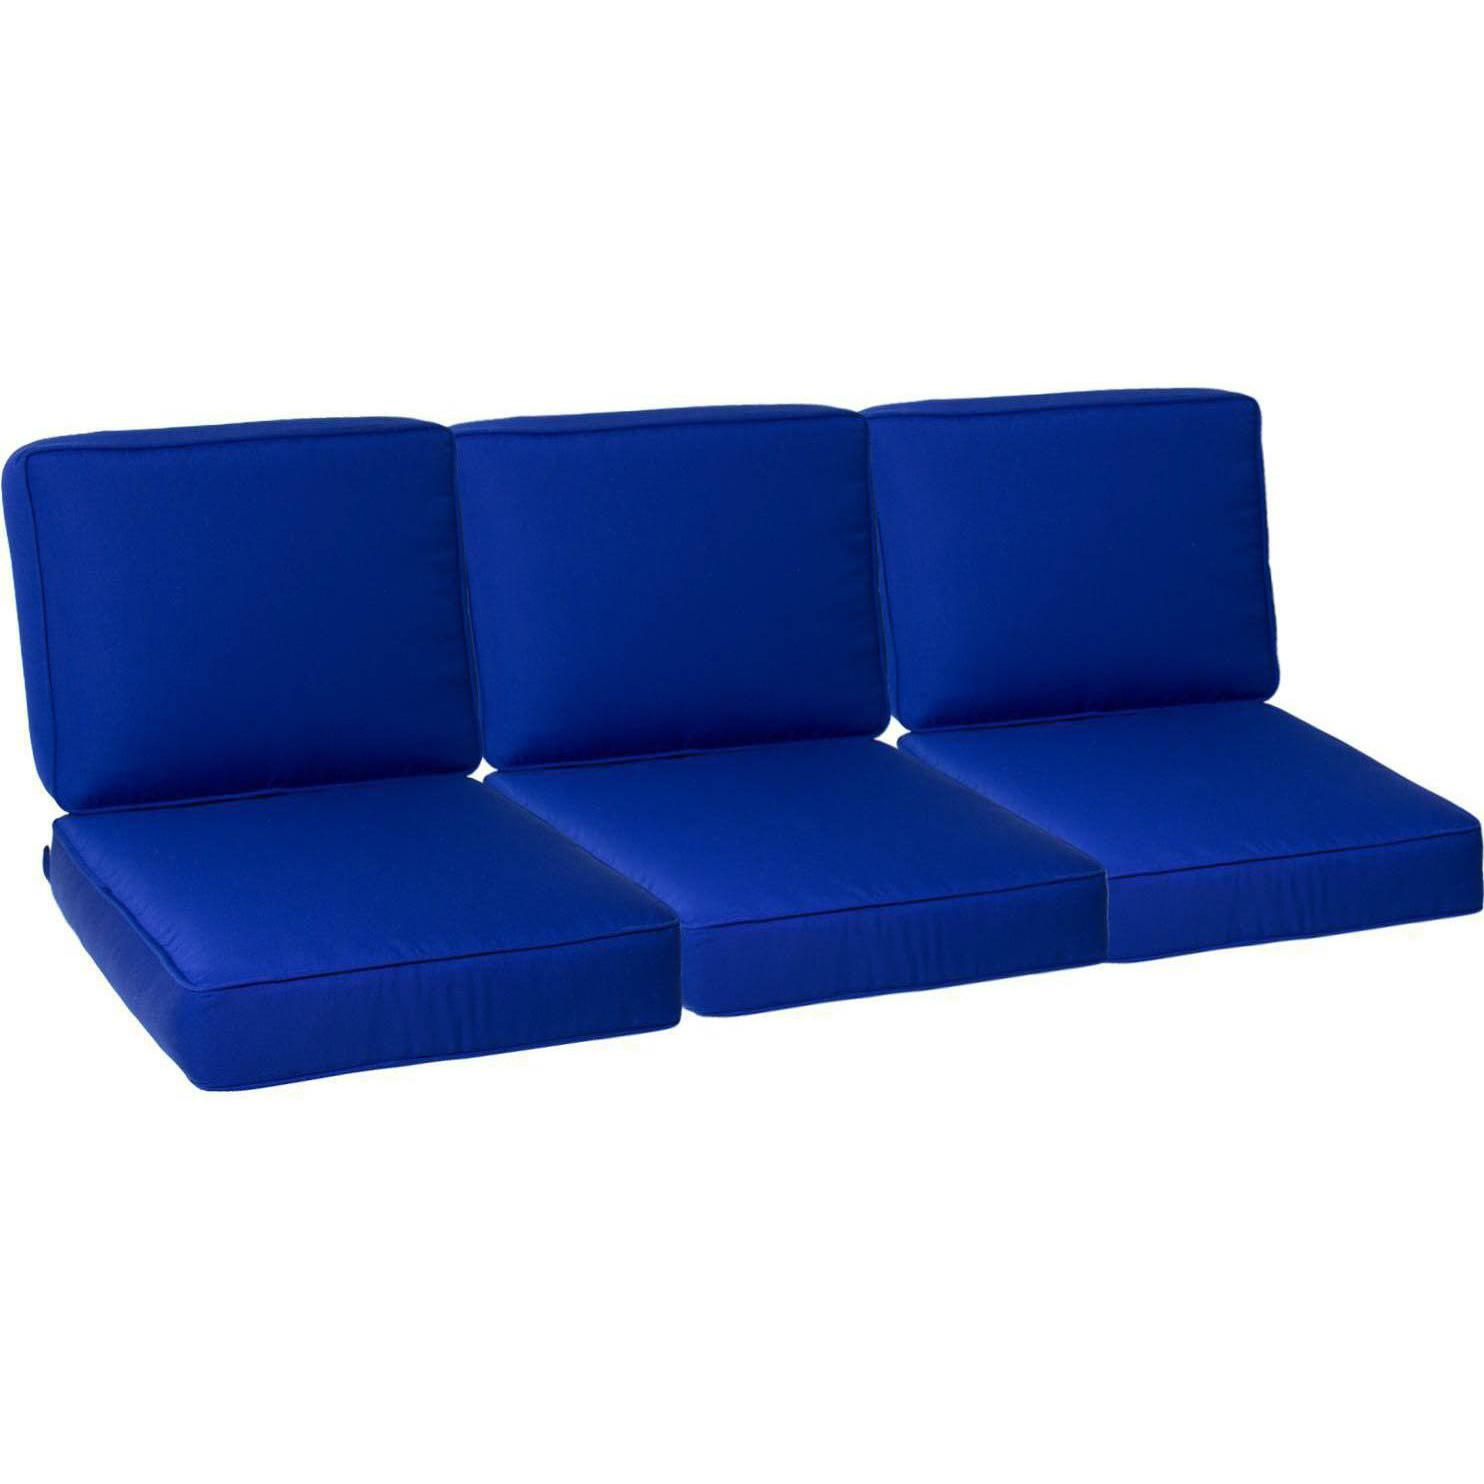 Attirant Sunbrella Canvas True Blue Small Outdoor Replacement Sofa Cushion Set W/  Piping By UltimatePatio.com